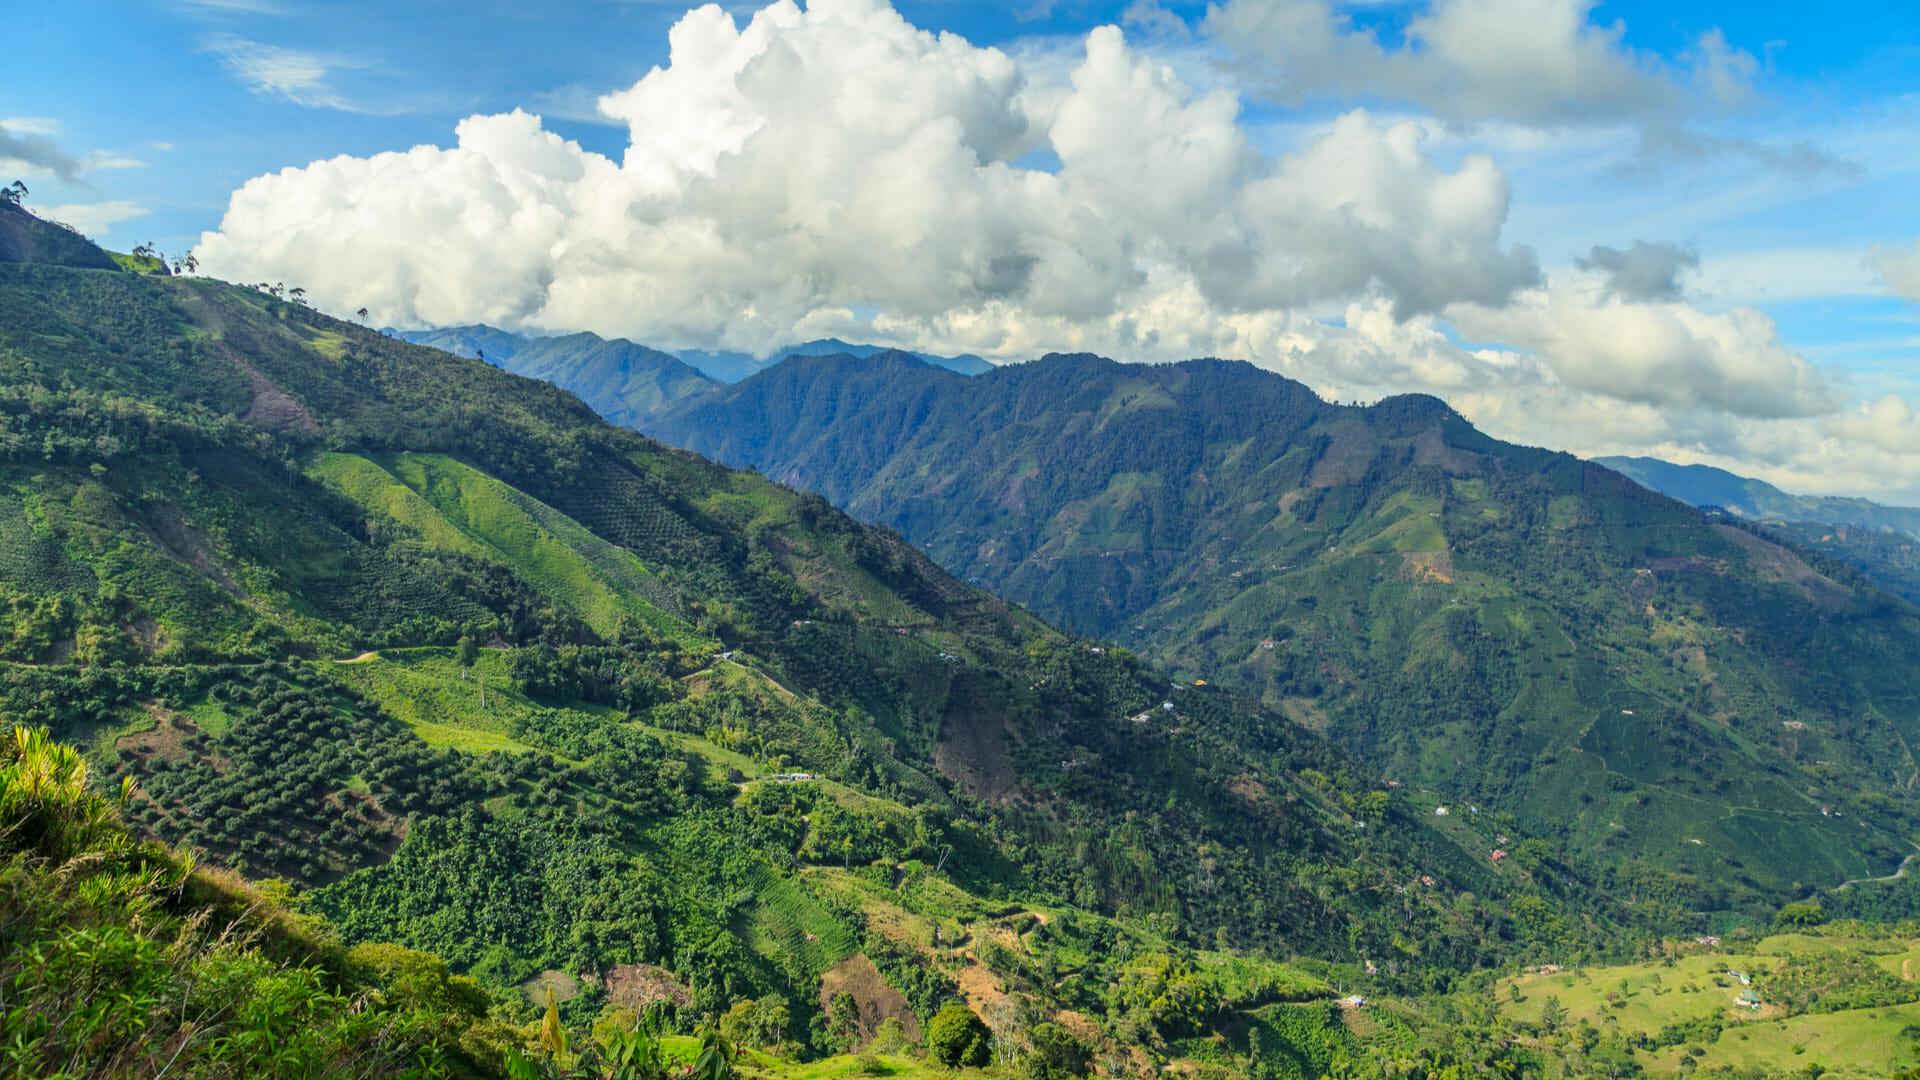 colombian-mountains-coffee-plantation.jp